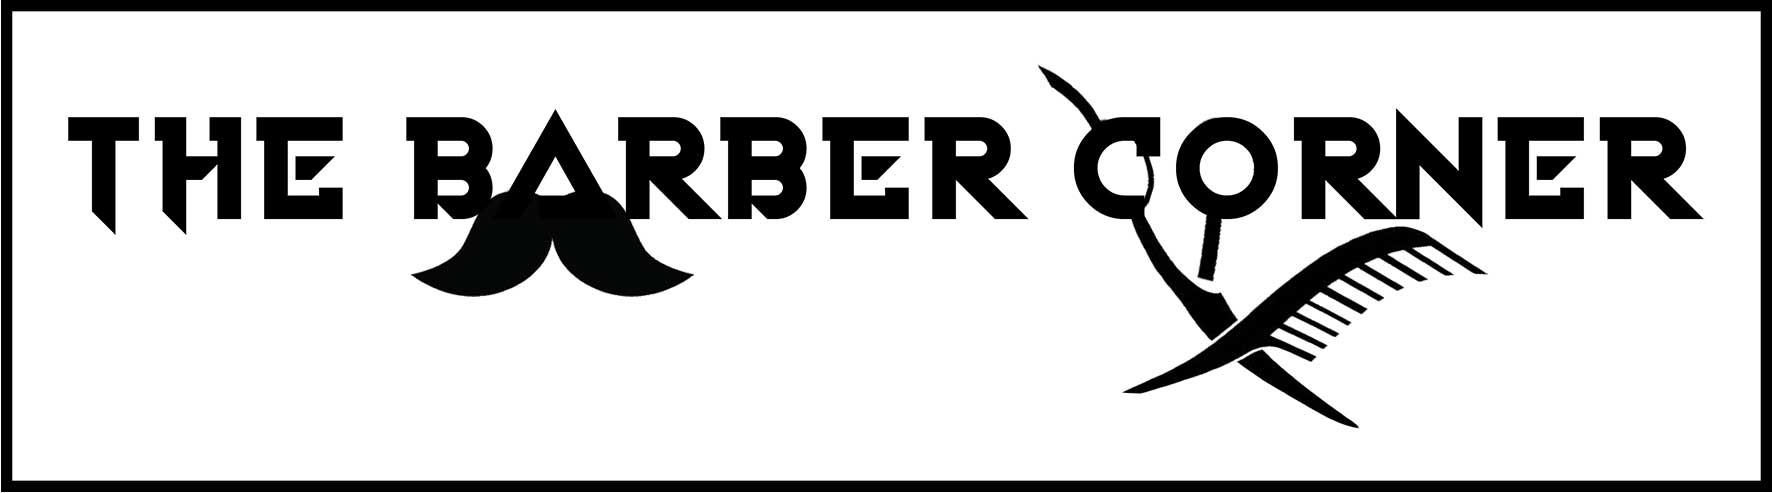 logo the barber corner